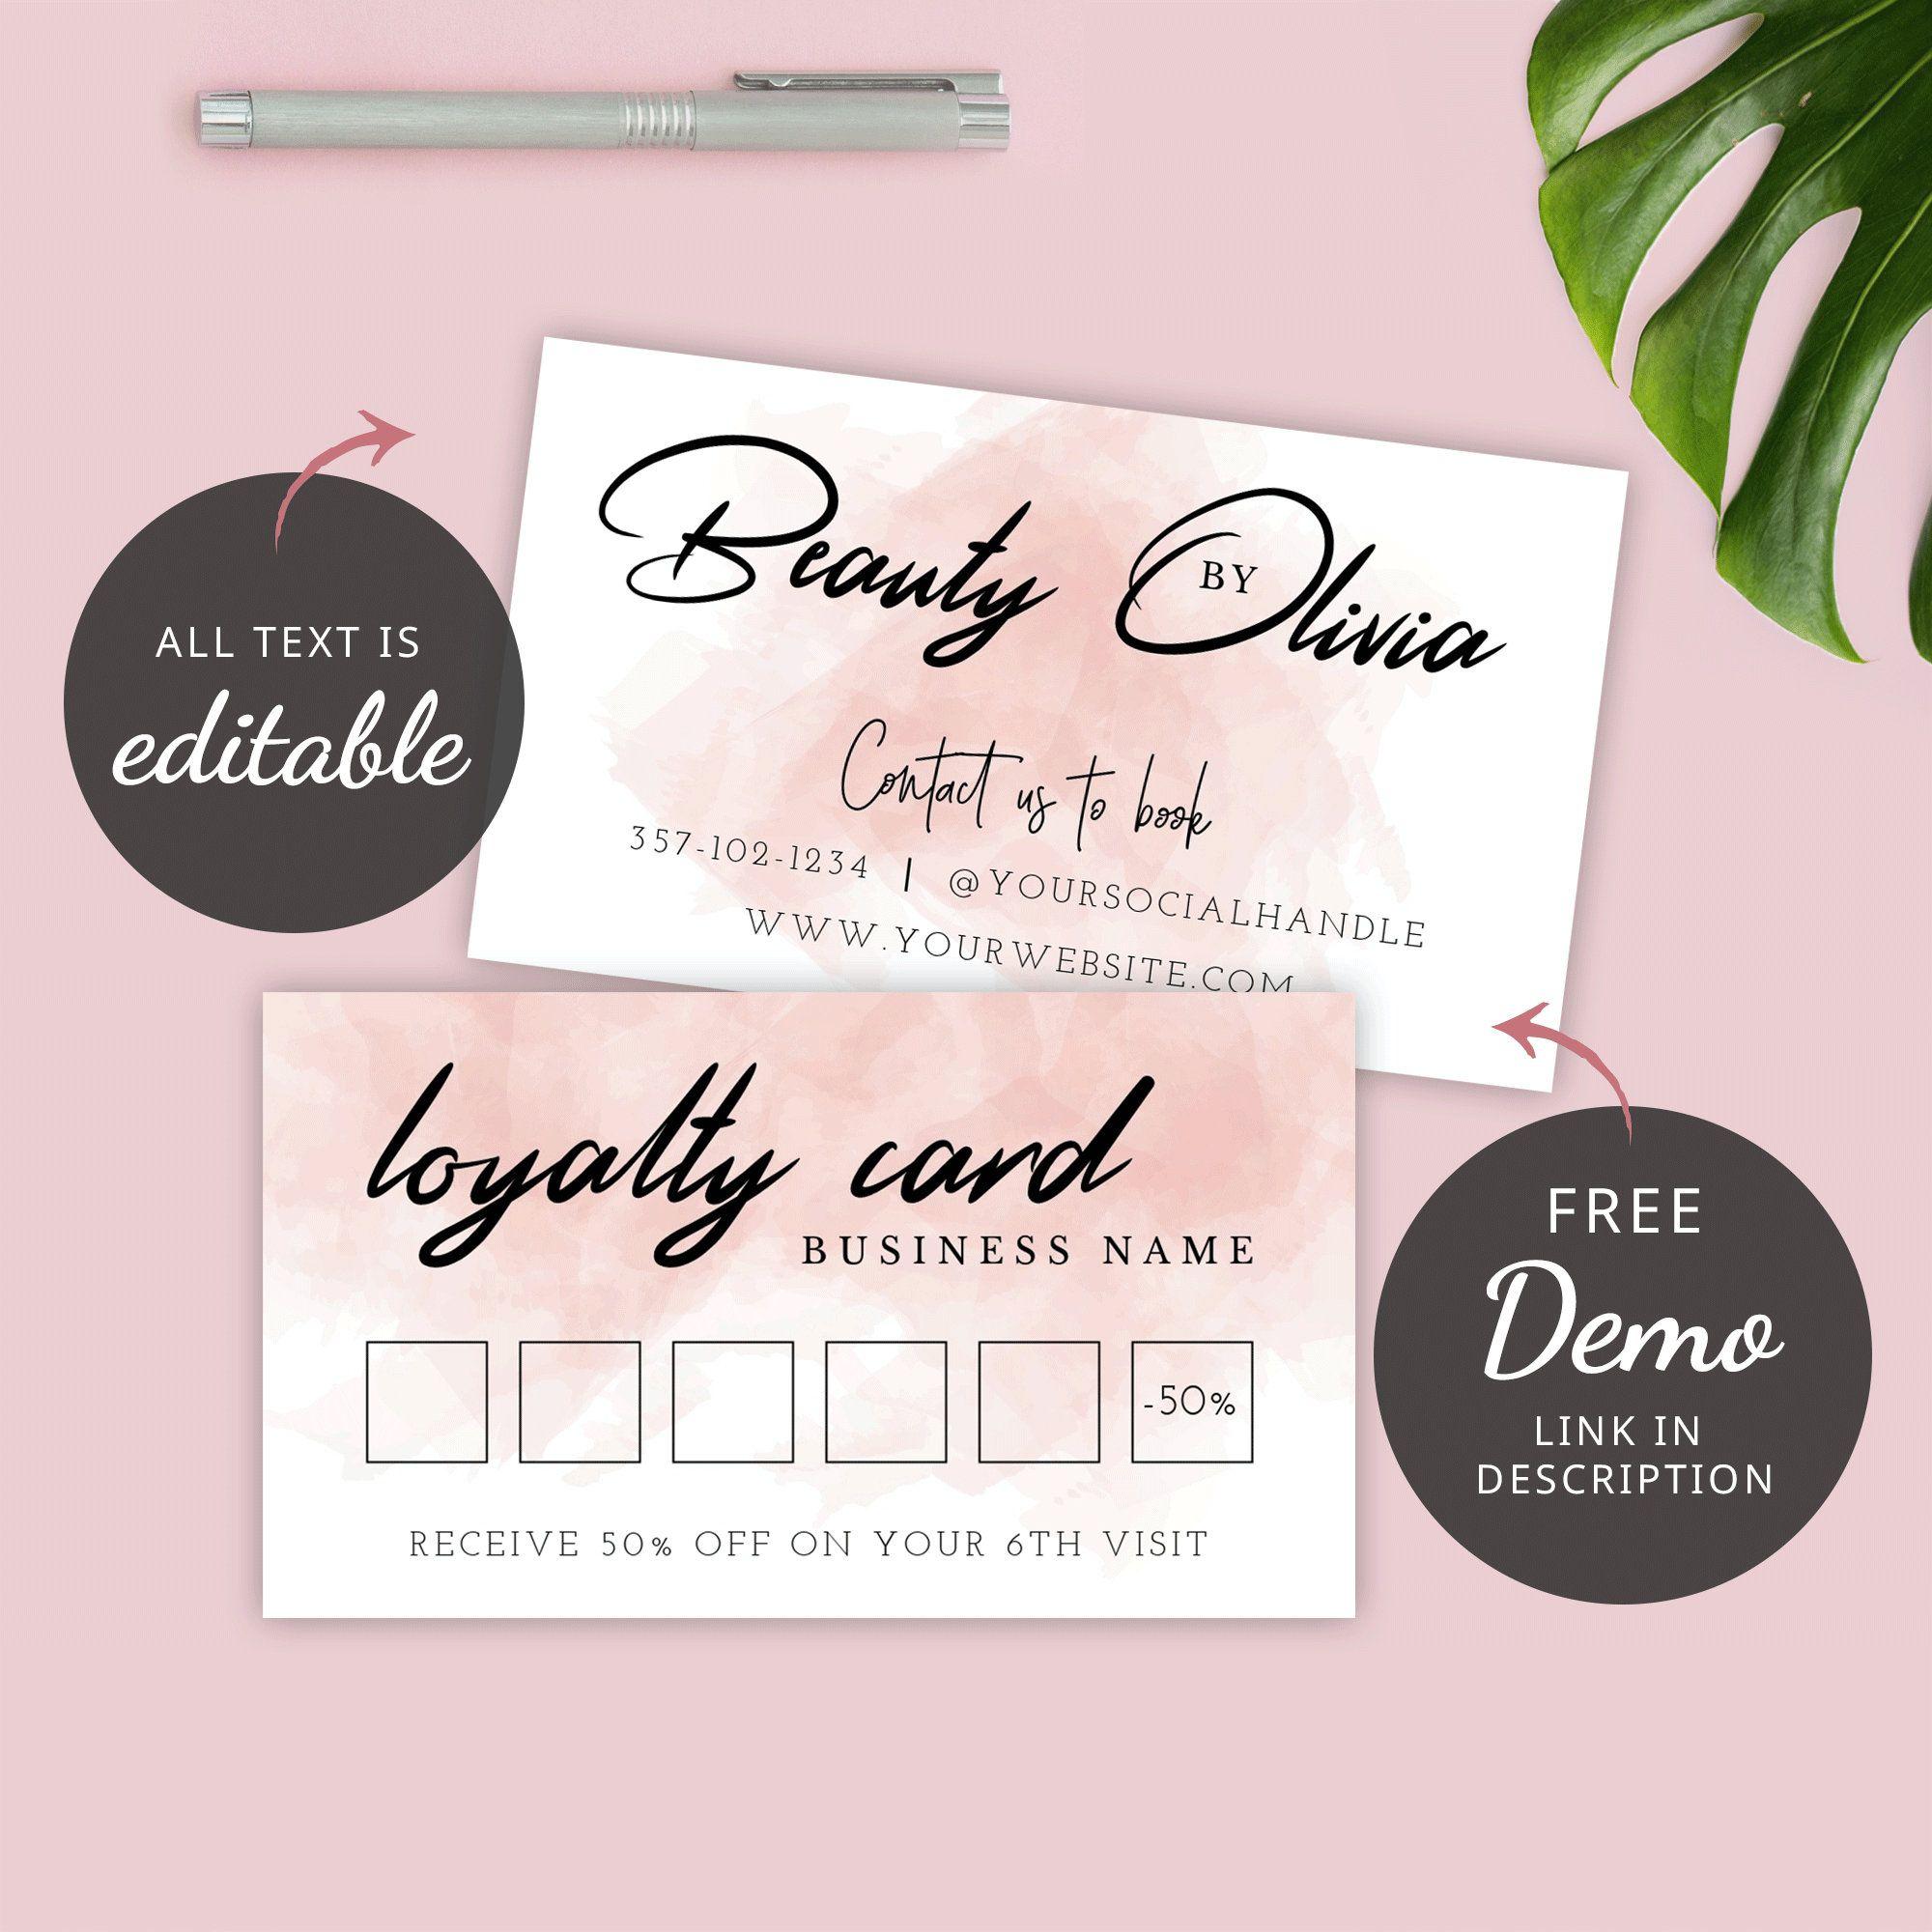 Editable Rewards Card Beauty Loyalty Card Template Diy Etsy In 2021 Loyalty Card Template Loyalty Card Design Diy Loyalty Cards